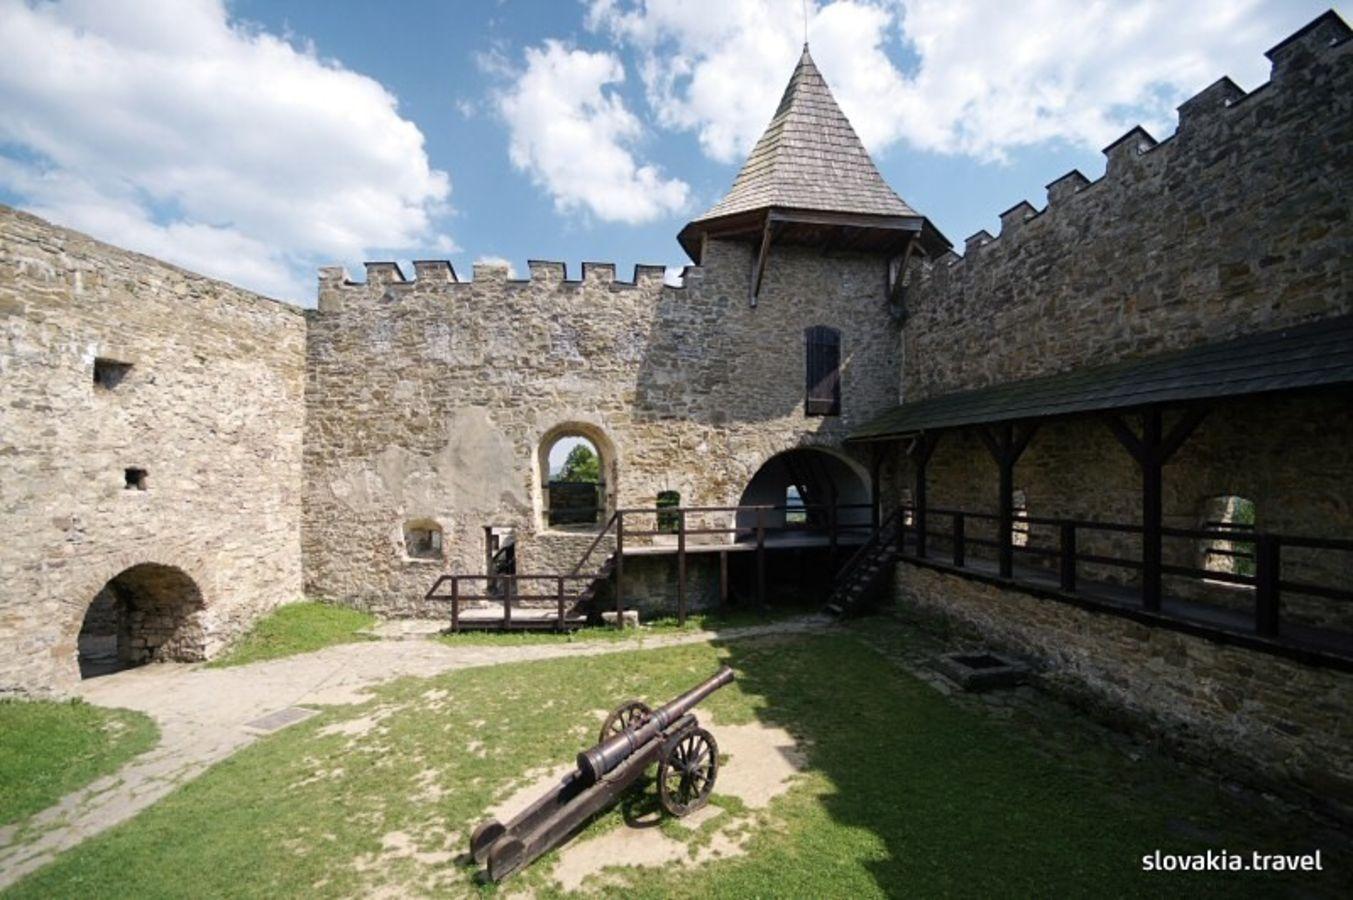 The Ľubovňa Castle - Slovakia.travel